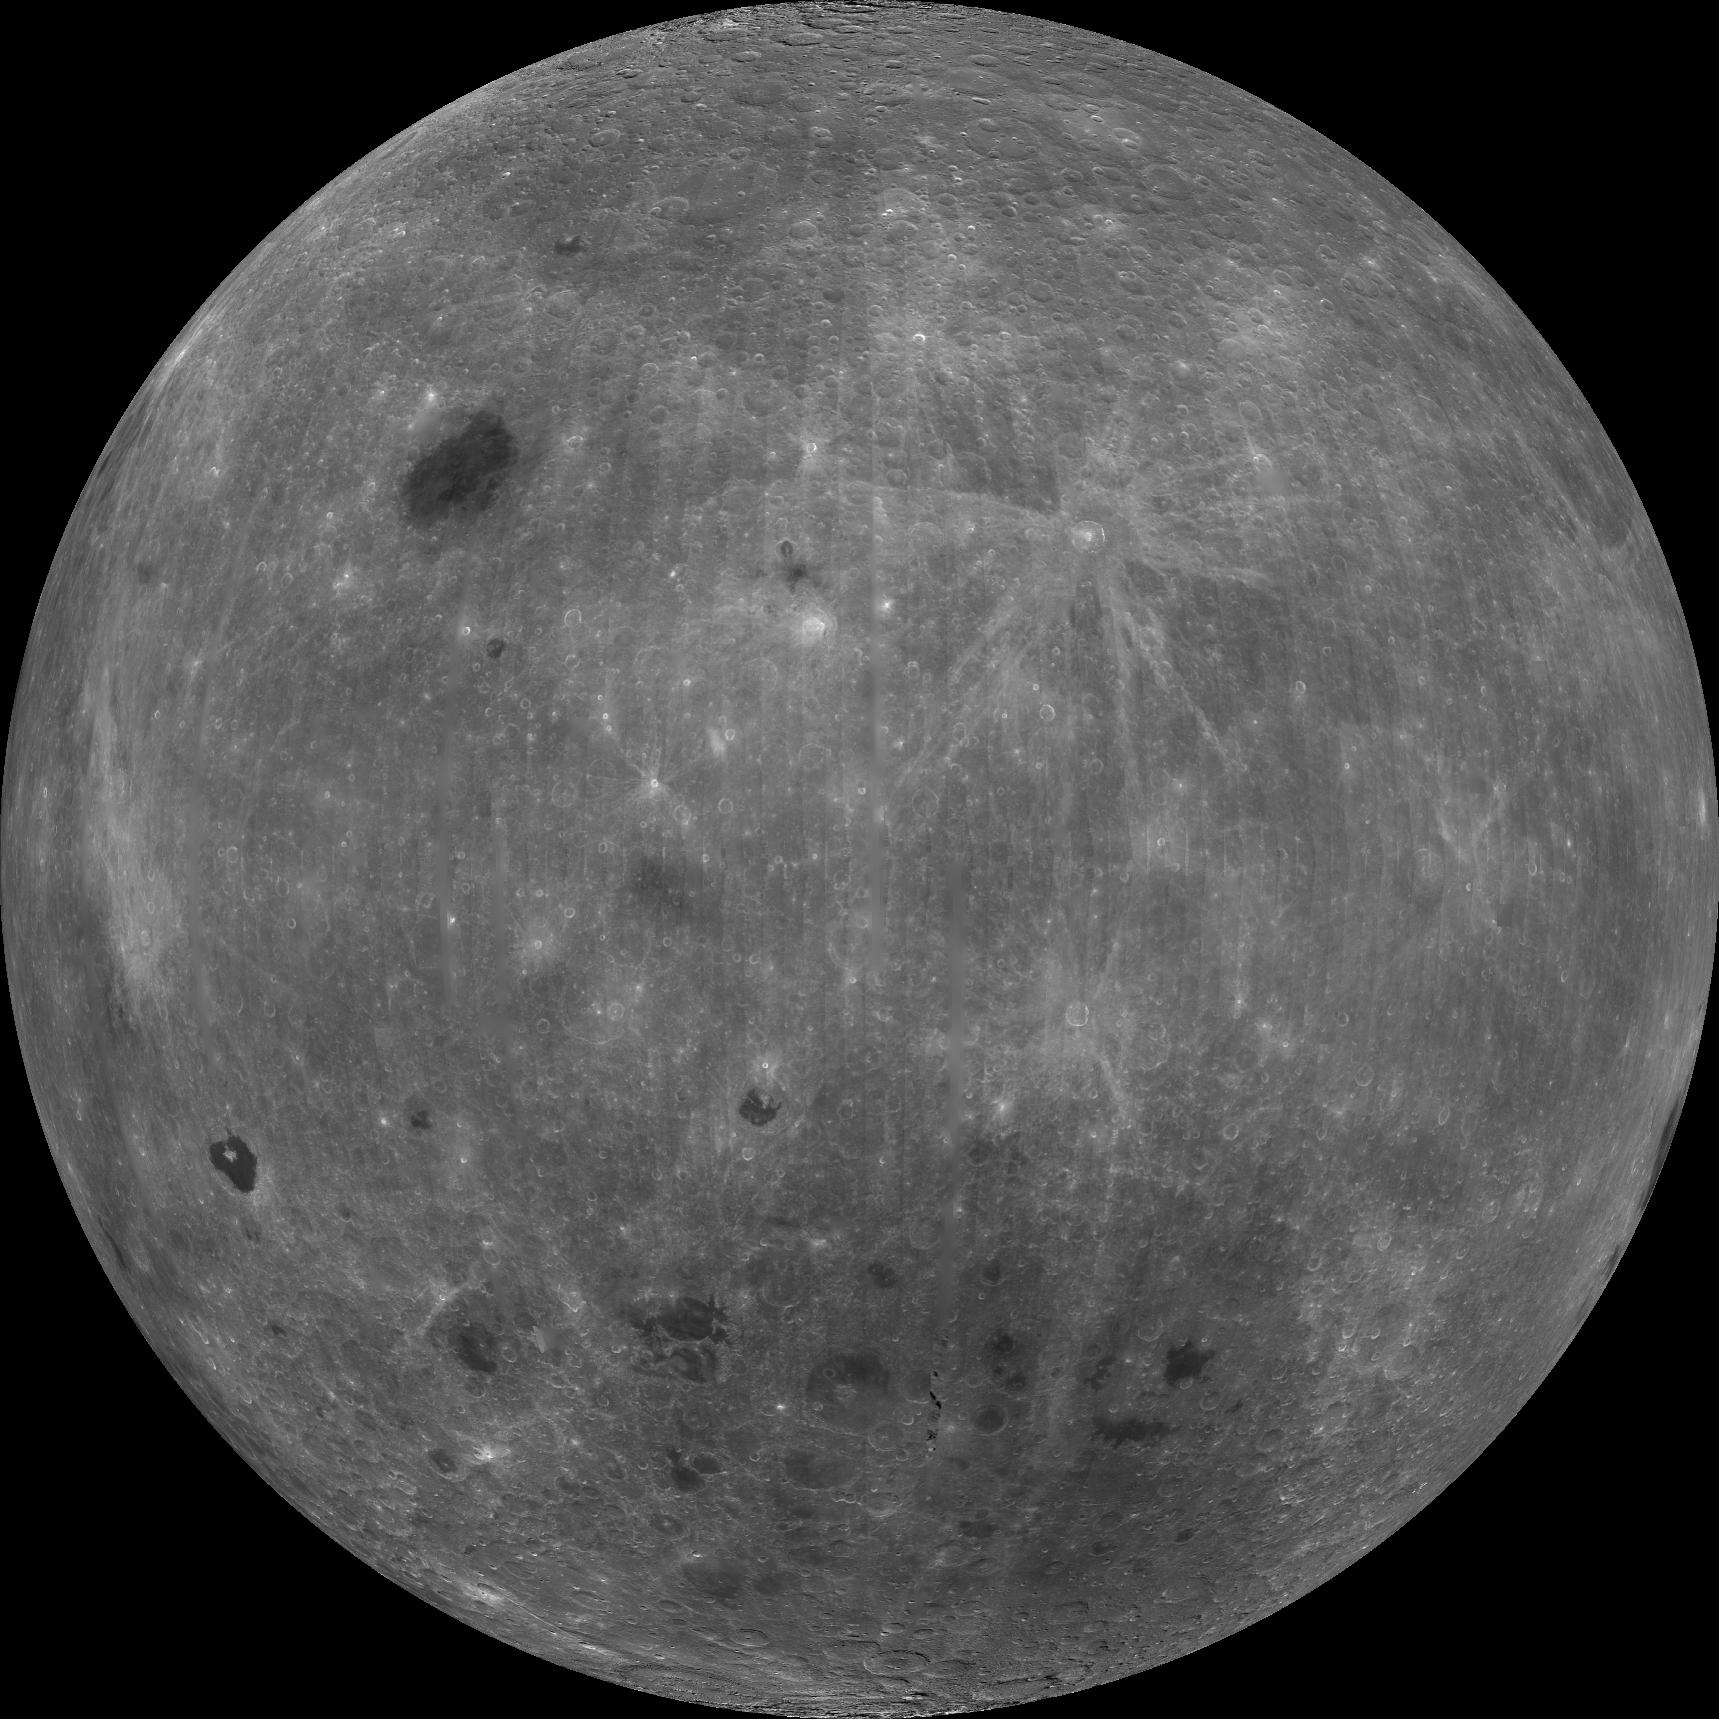 【ESA】欧州宇宙機関が「月面」に村を作る構想…将来、月でビジネス、観光、採鉱などをする予定